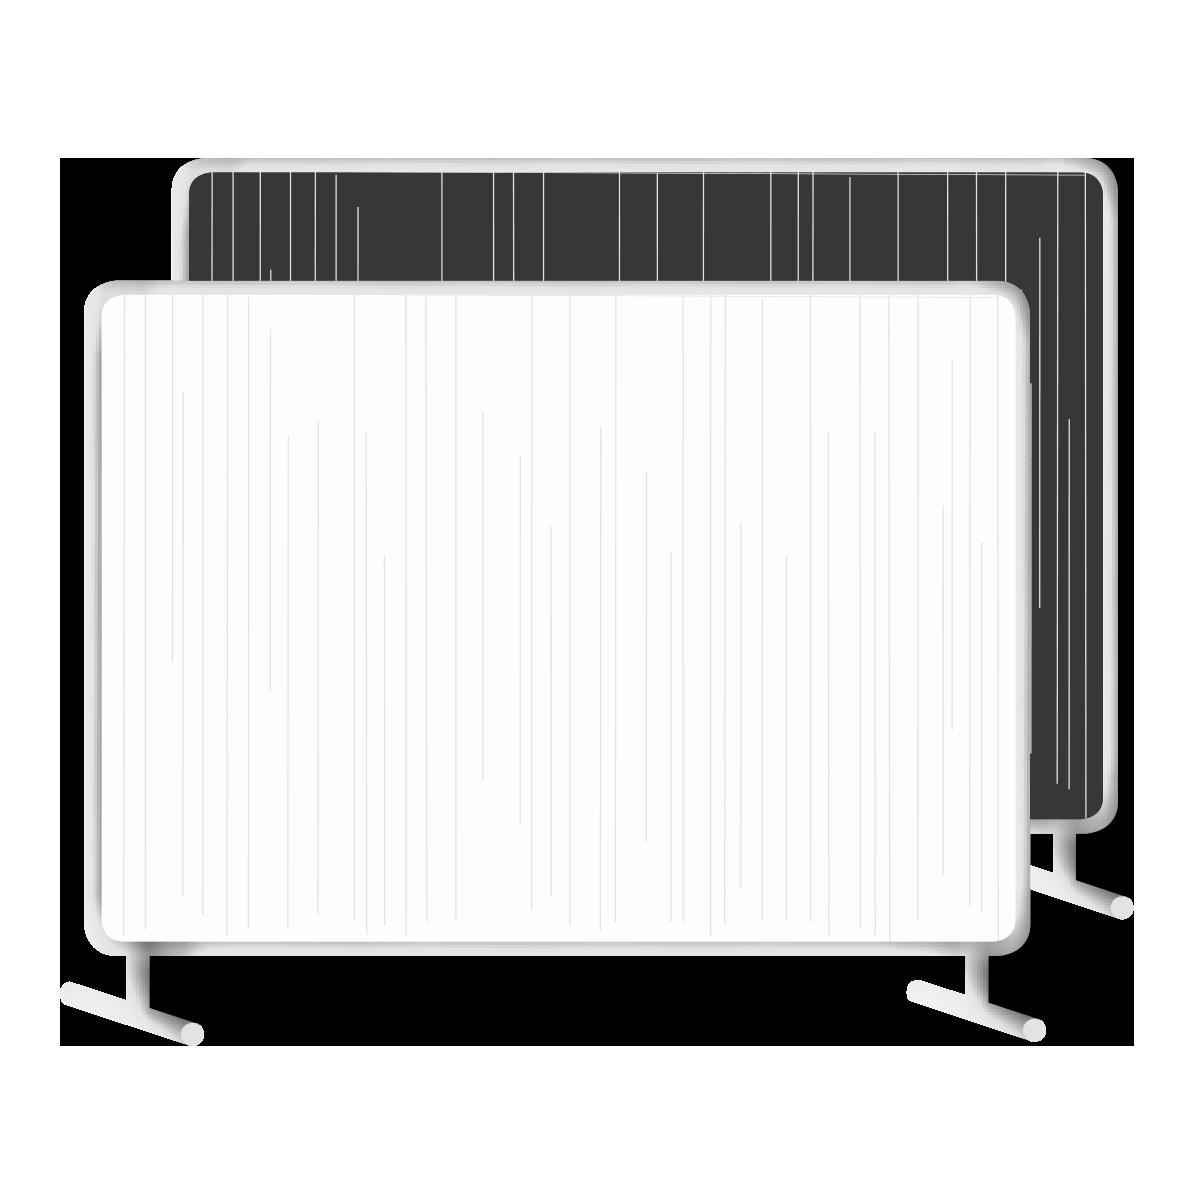 Paravante, 2300 x 5300 cm, schwarz Molton